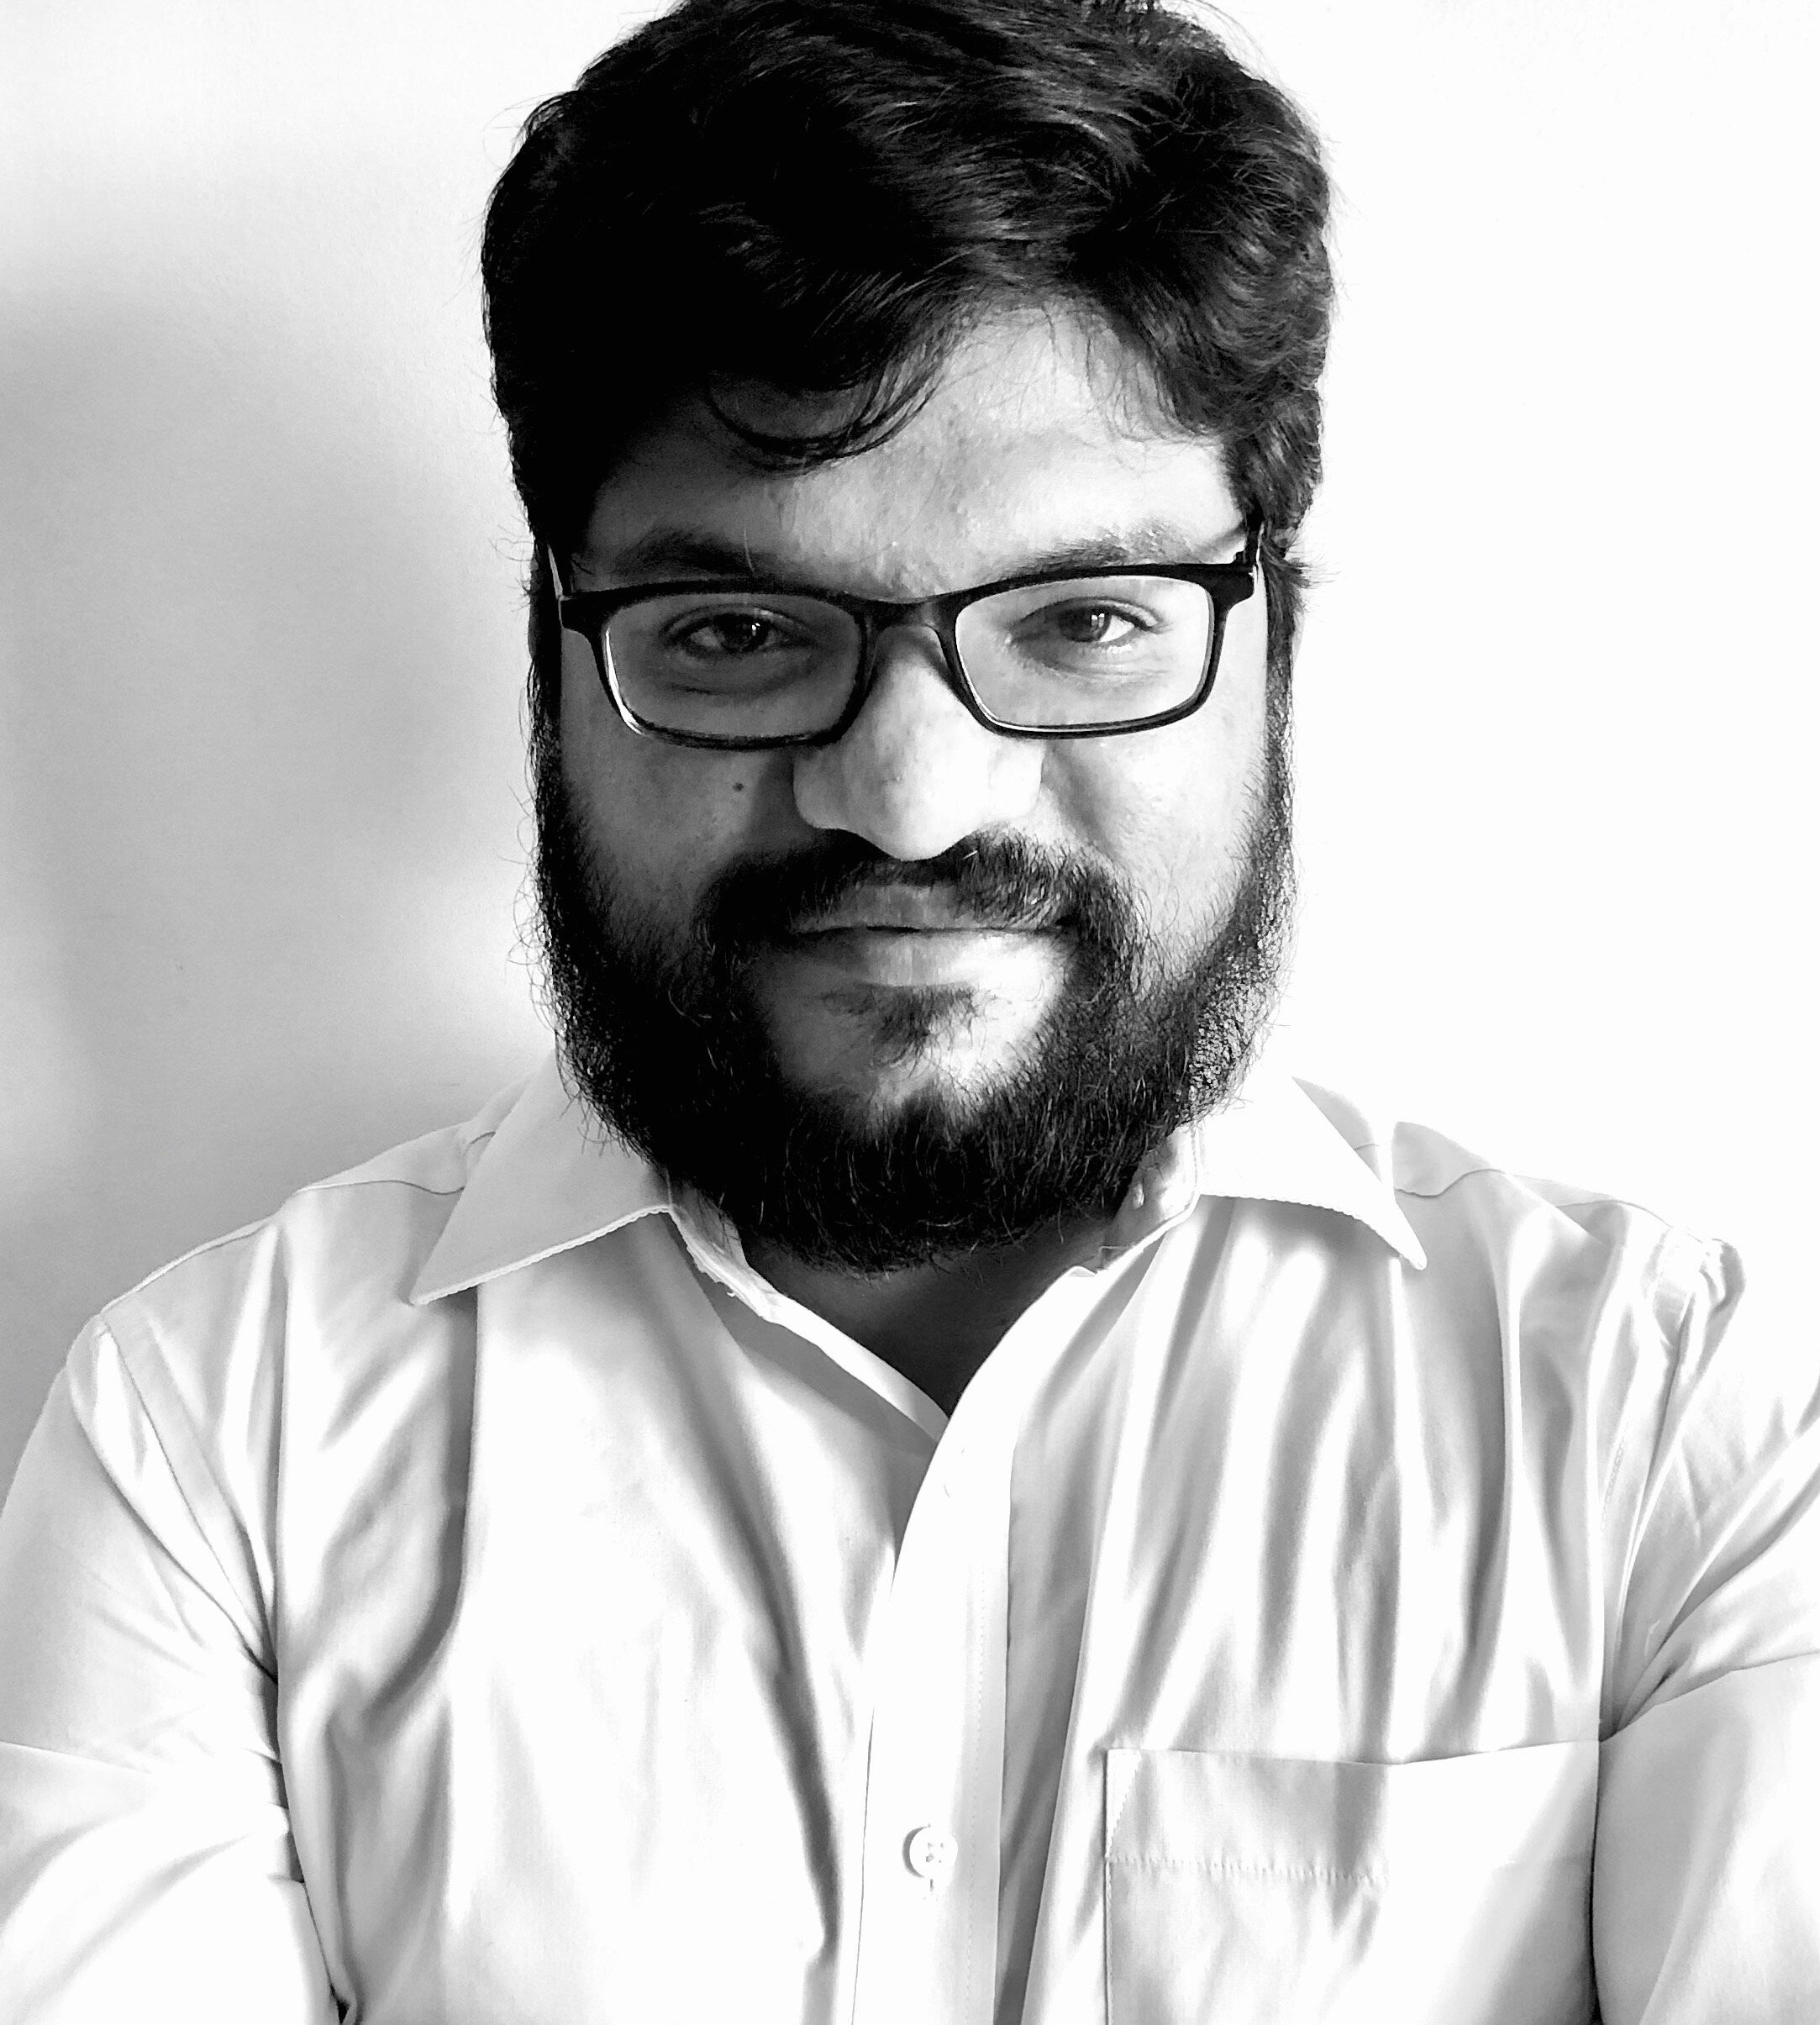 Gowthaman Natarajan